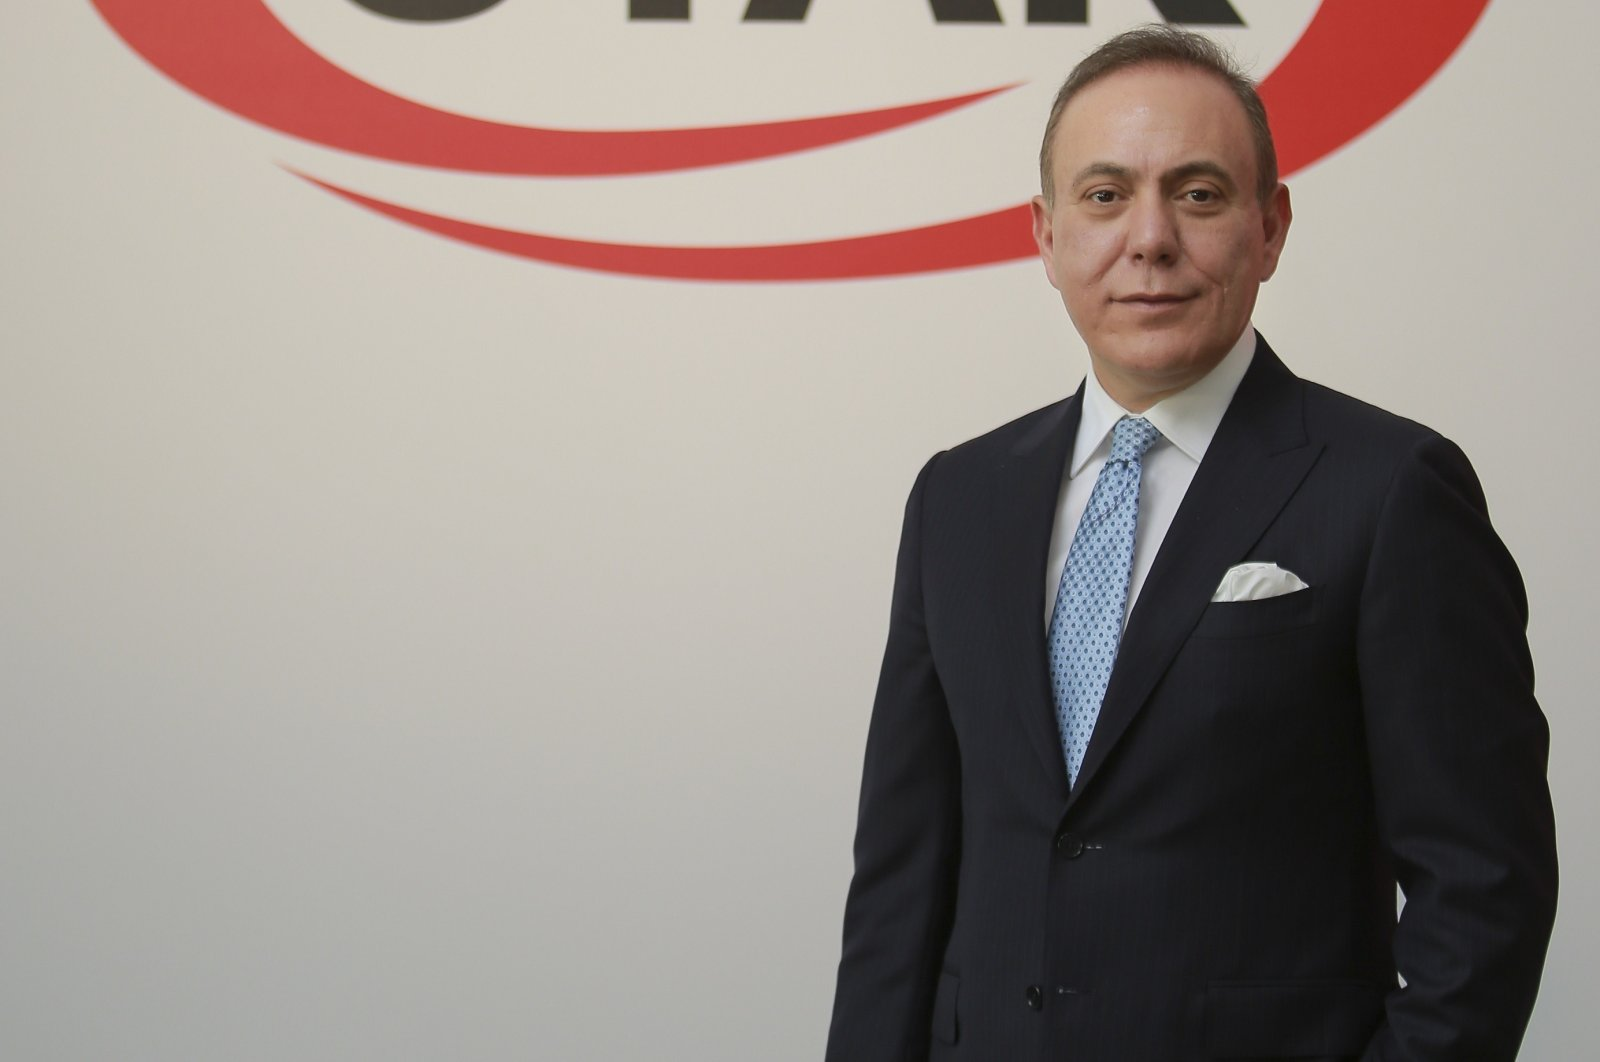 OYAK CEO Süleyman Savaş Erdem, Oct. 5, 2020. (IHA Photo)